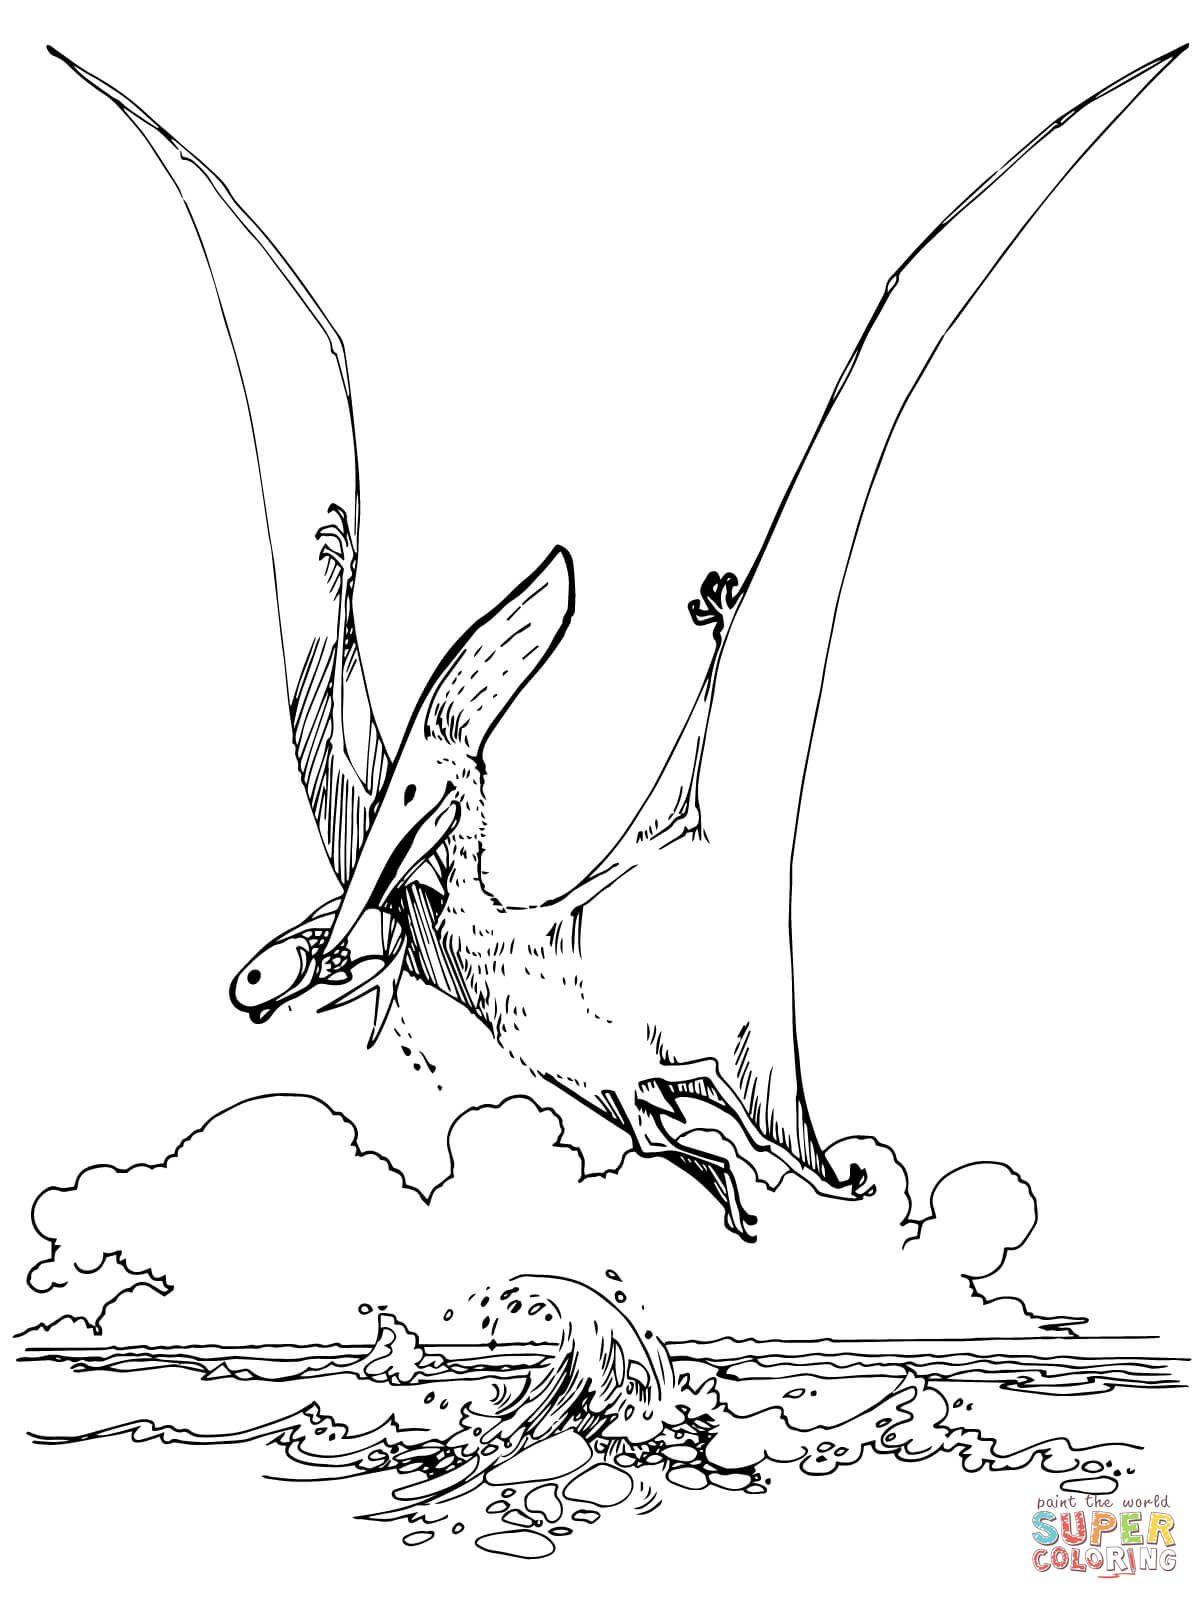 Pteranodon Pterosaur Super Coloring In 2019 Dinosaur Coloring